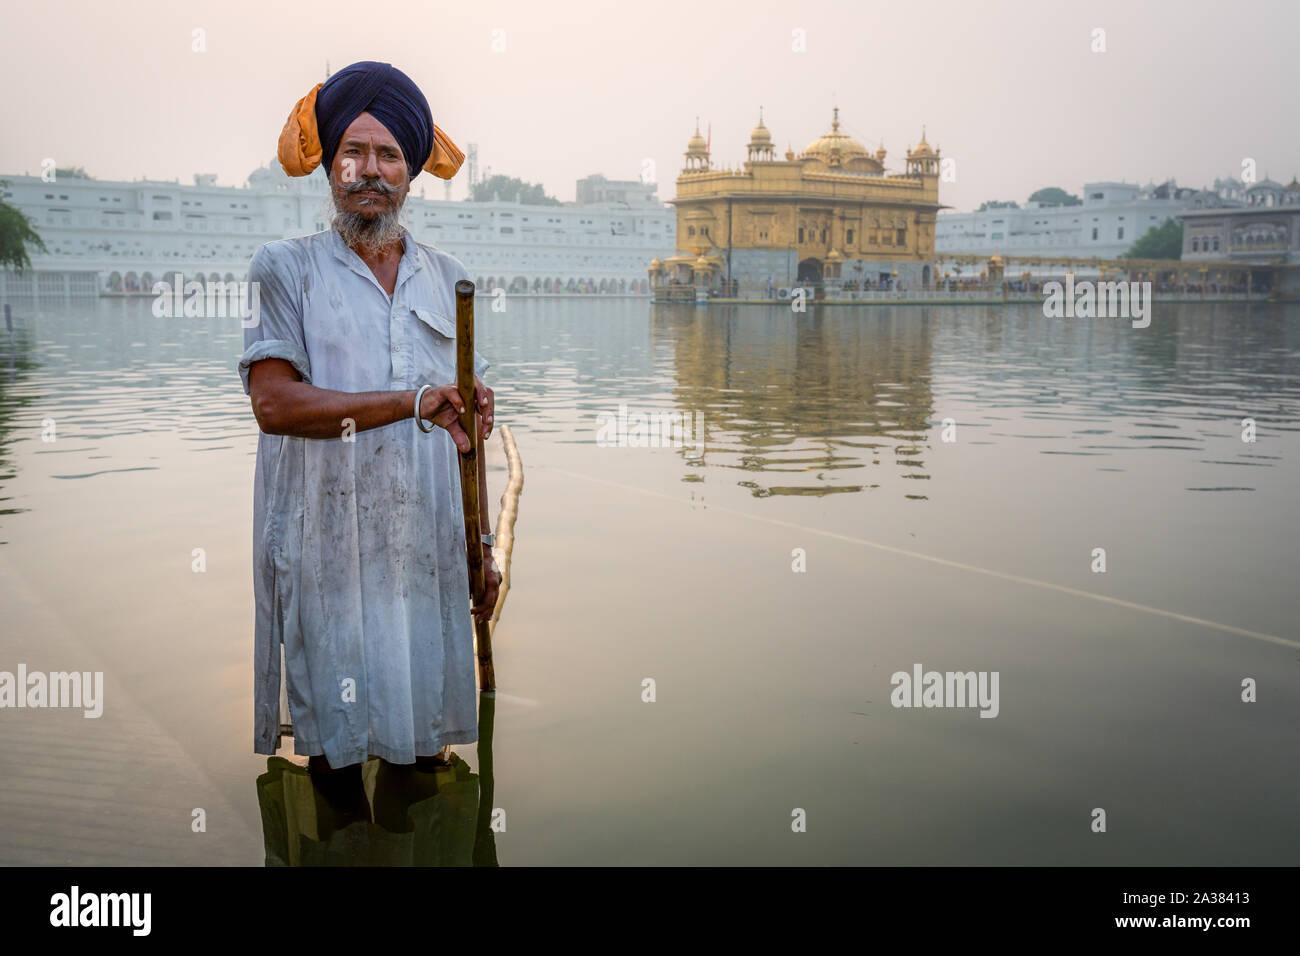 A Sikh cleans the Sarovar (water tank) – around the Golden Temple (Sri Harmandir Sahib),  Amritsar, Punjab, India Stock Photo